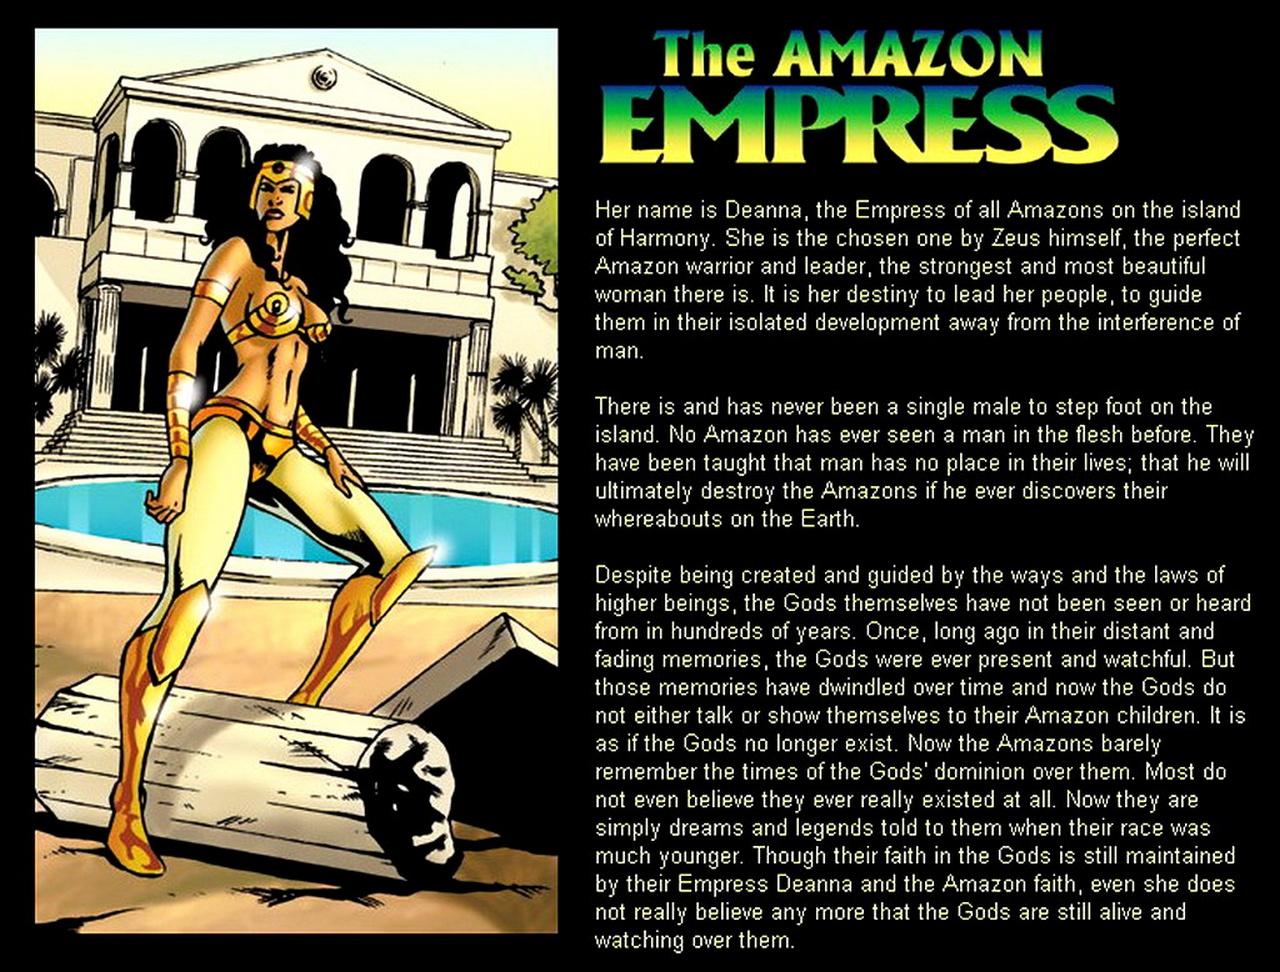 The Amazon Empress